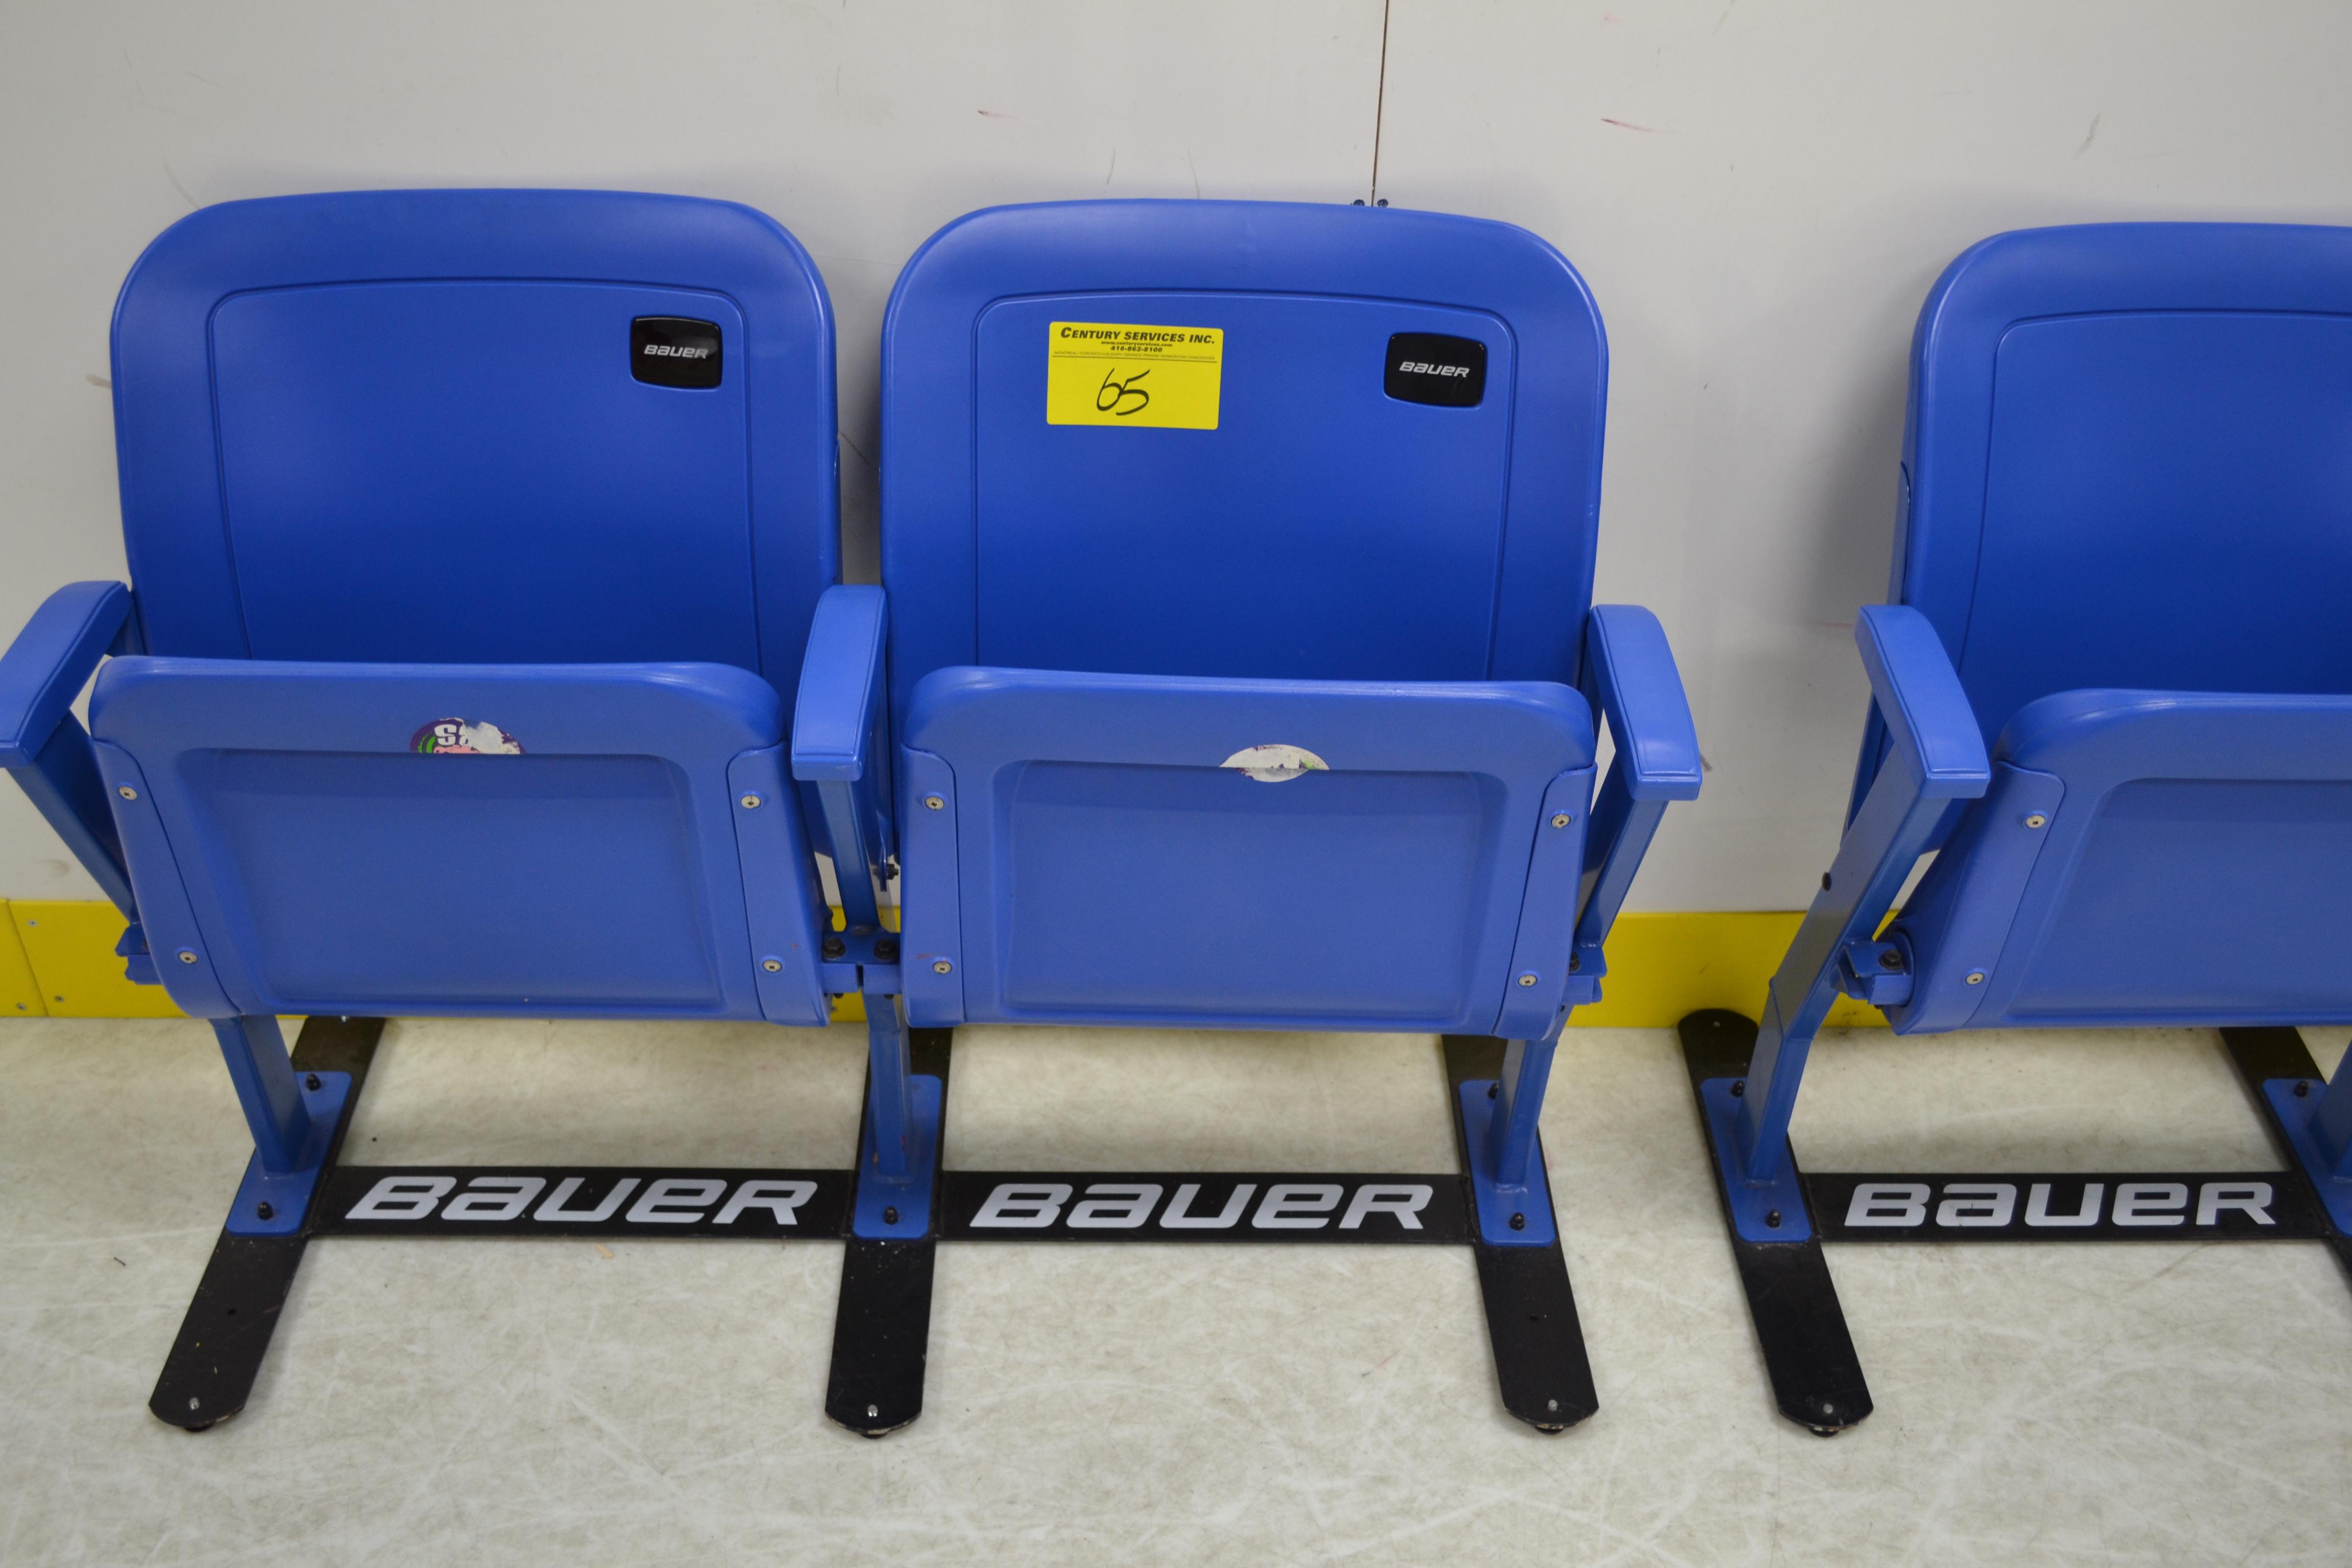 Bauer 2 seat stadium chairs